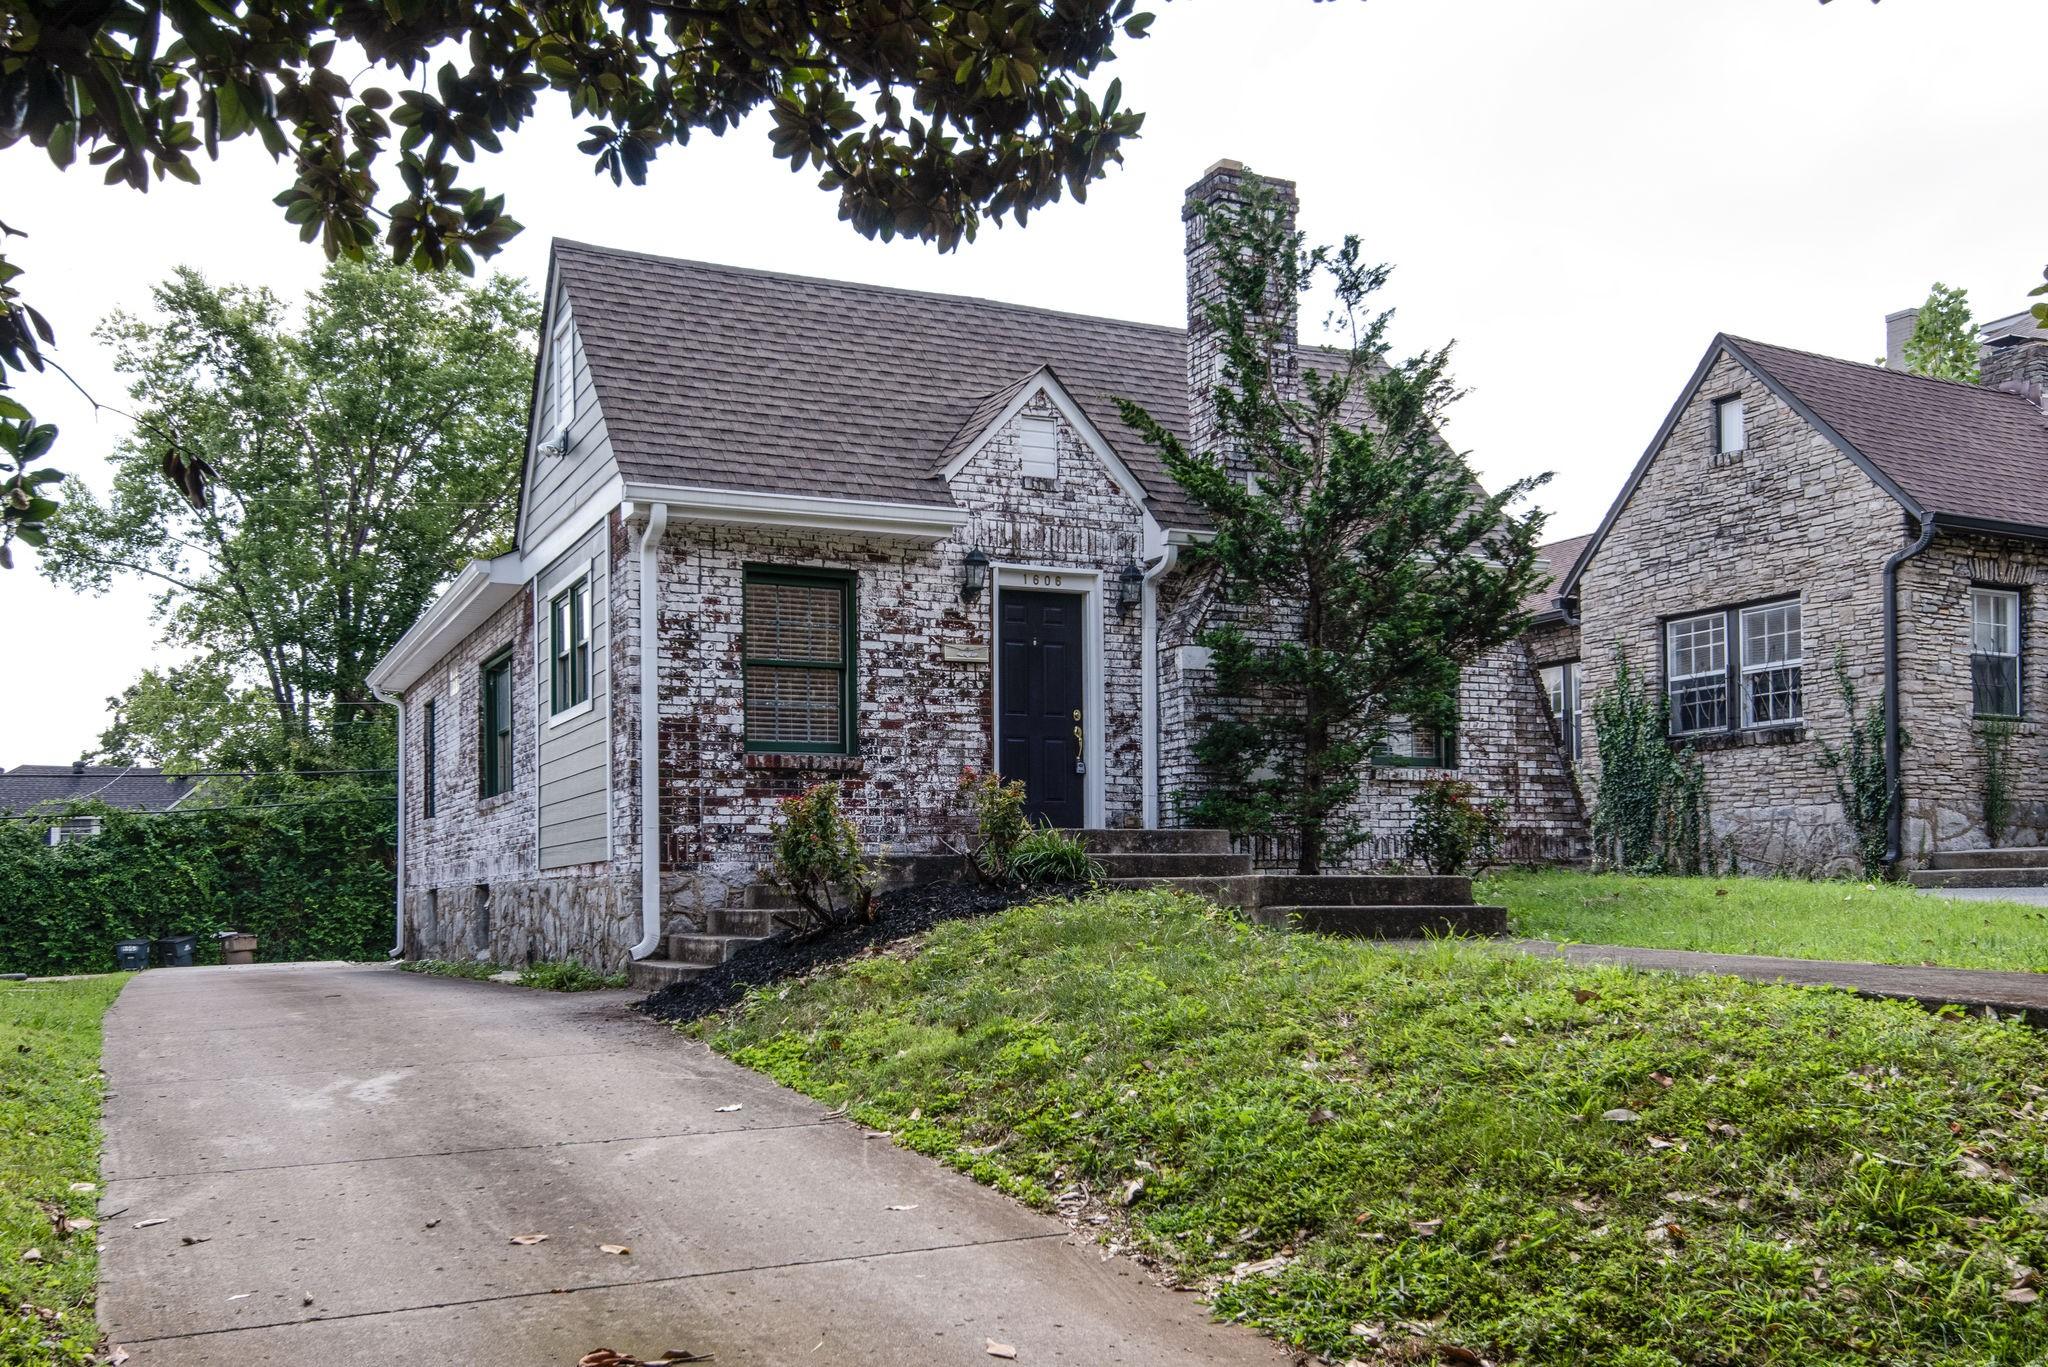 1606A 16th Ave S, Nashville, TN 37212 - Nashville, TN real estate listing